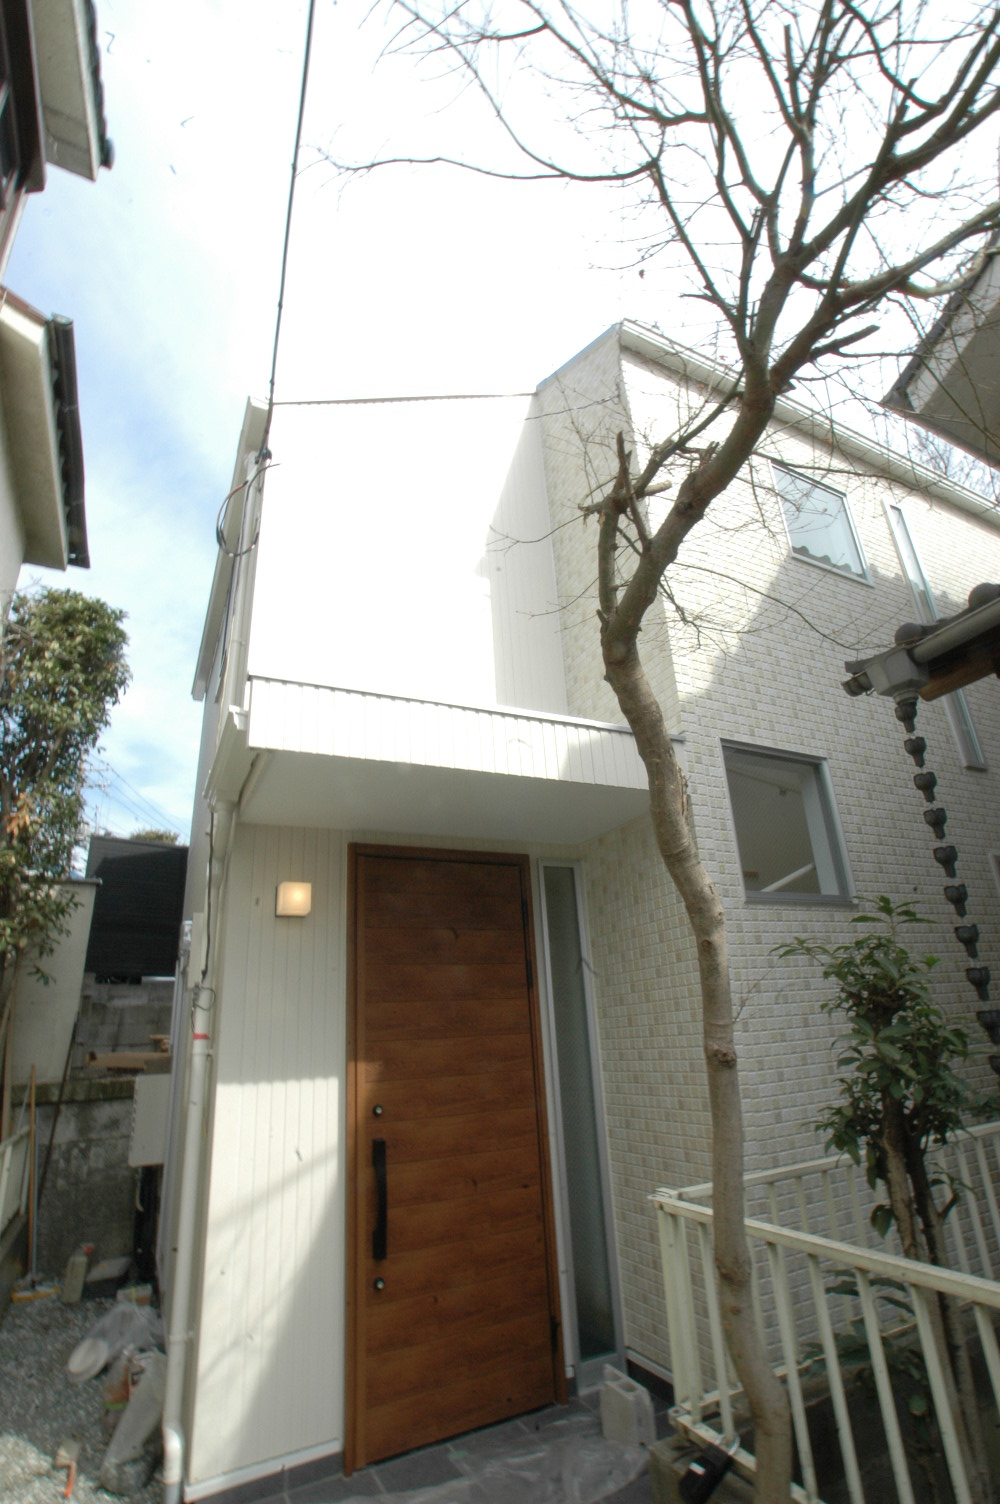 http://www.lifeplanet.jp/news/DSC_0377.JPG